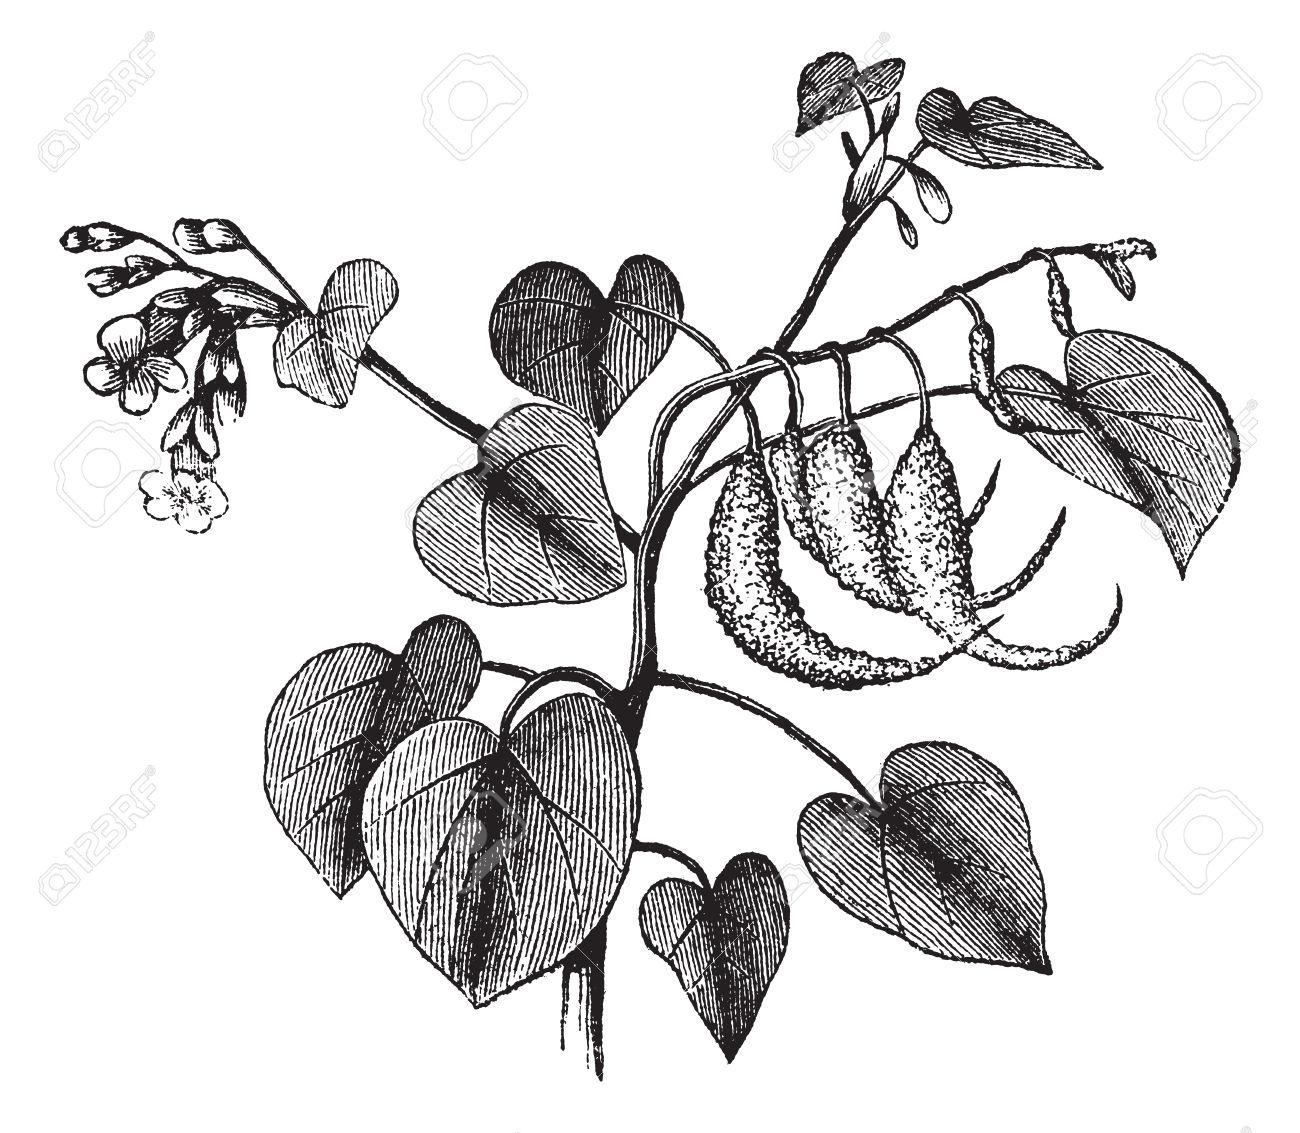 Ram's Horn Or Proboscidea Louisianica Or Martynia Proboscidea.